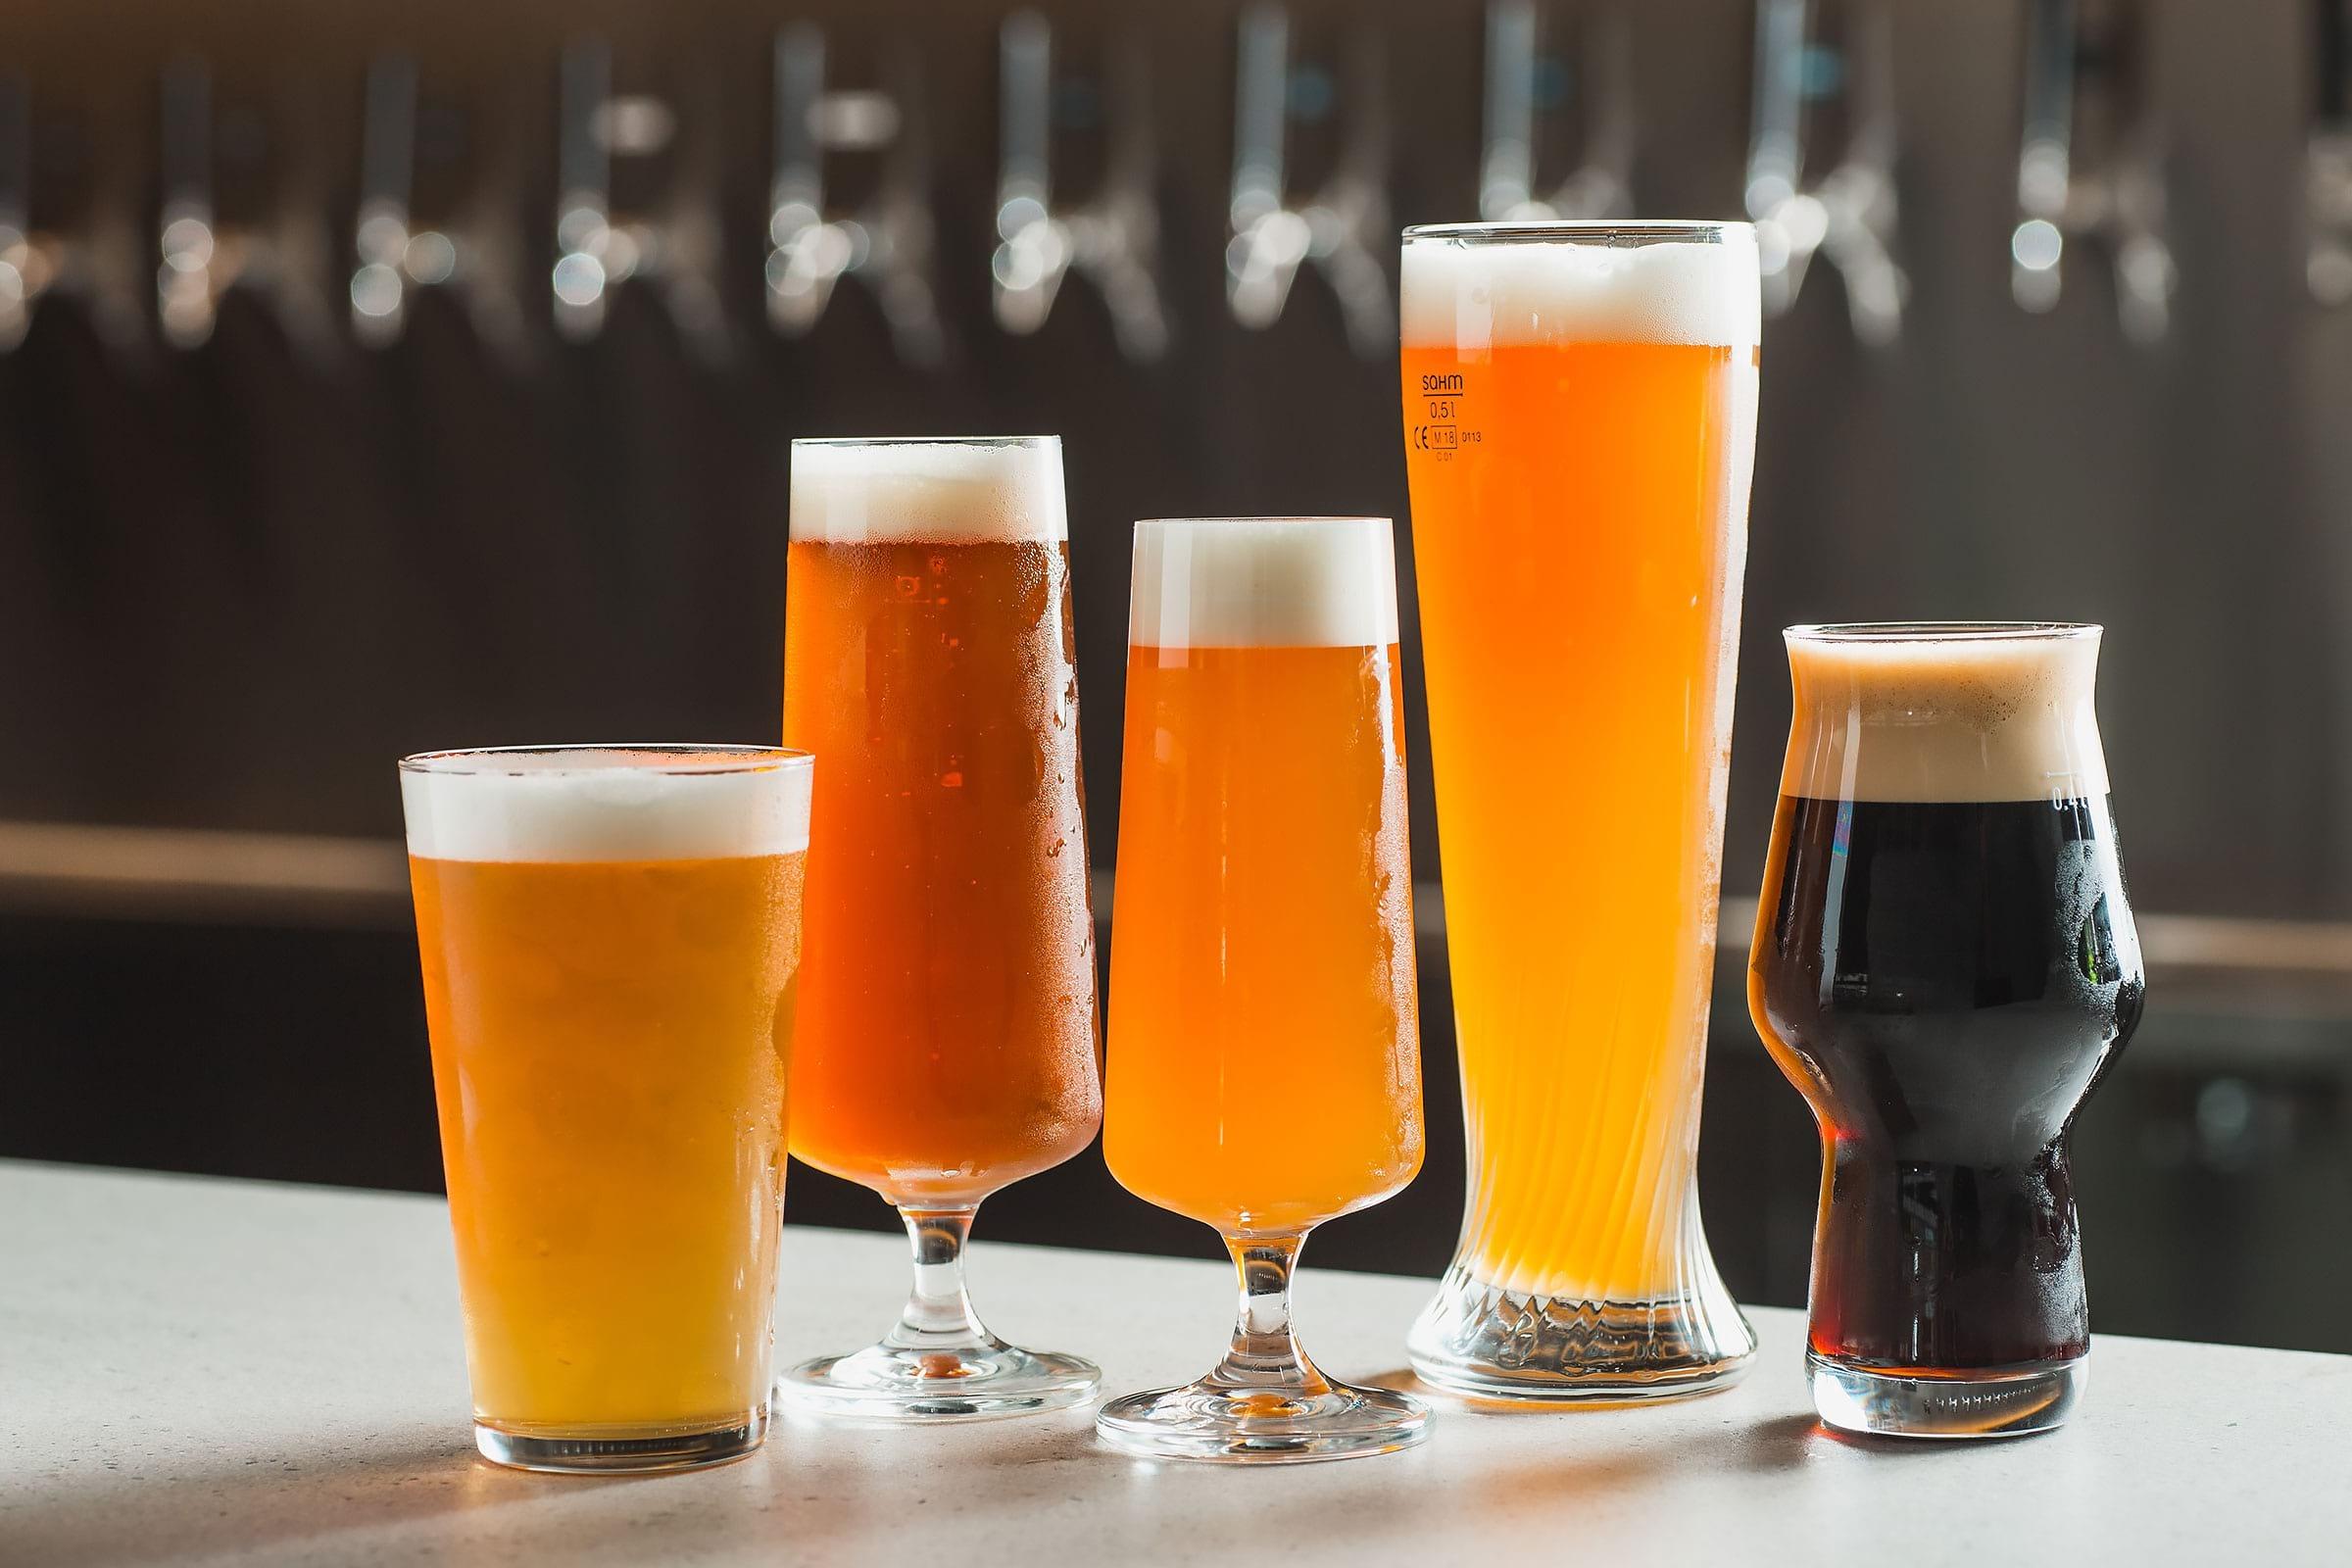 The guide to beer tastings in Stockholm